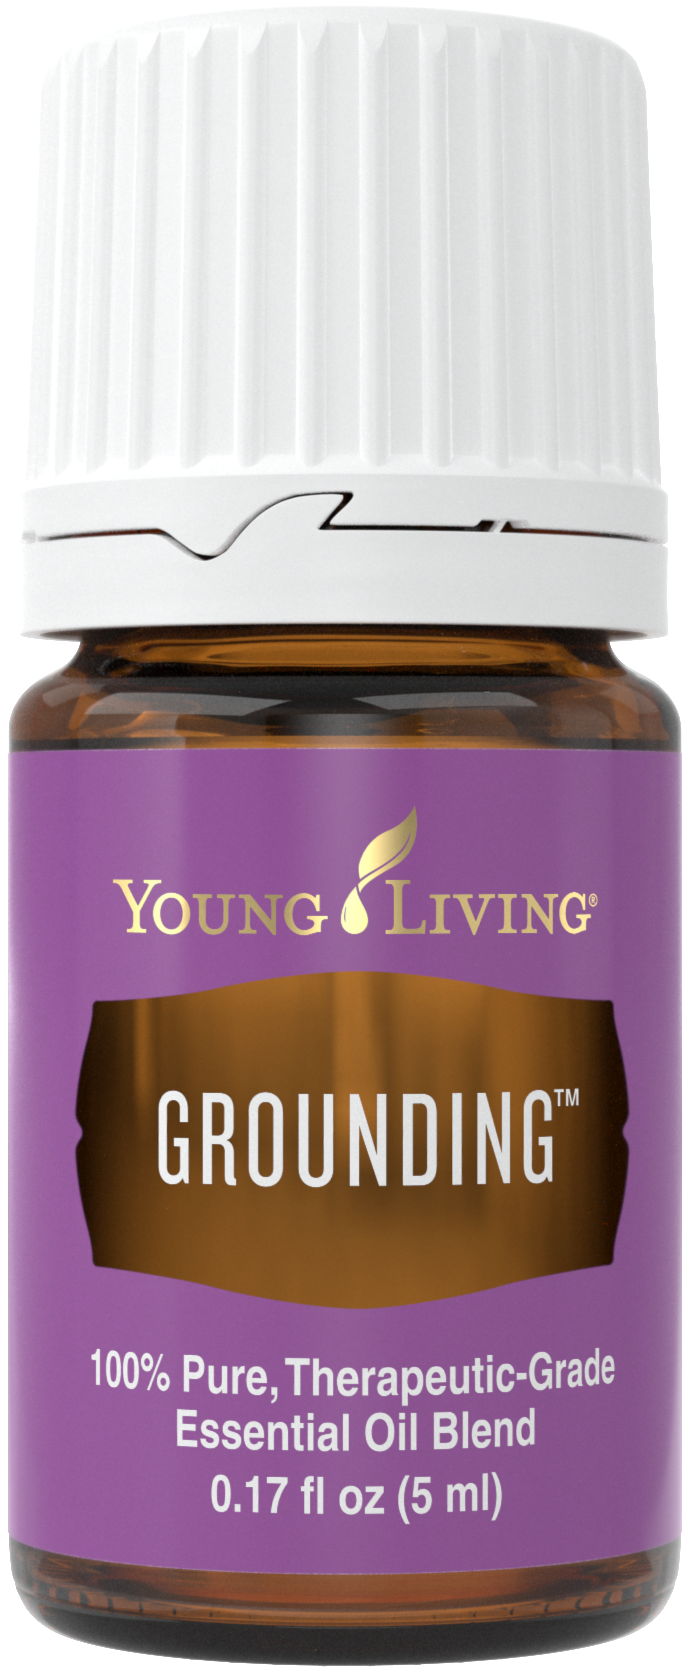 grounding_5ml_silo_us_2016_23899004654_o